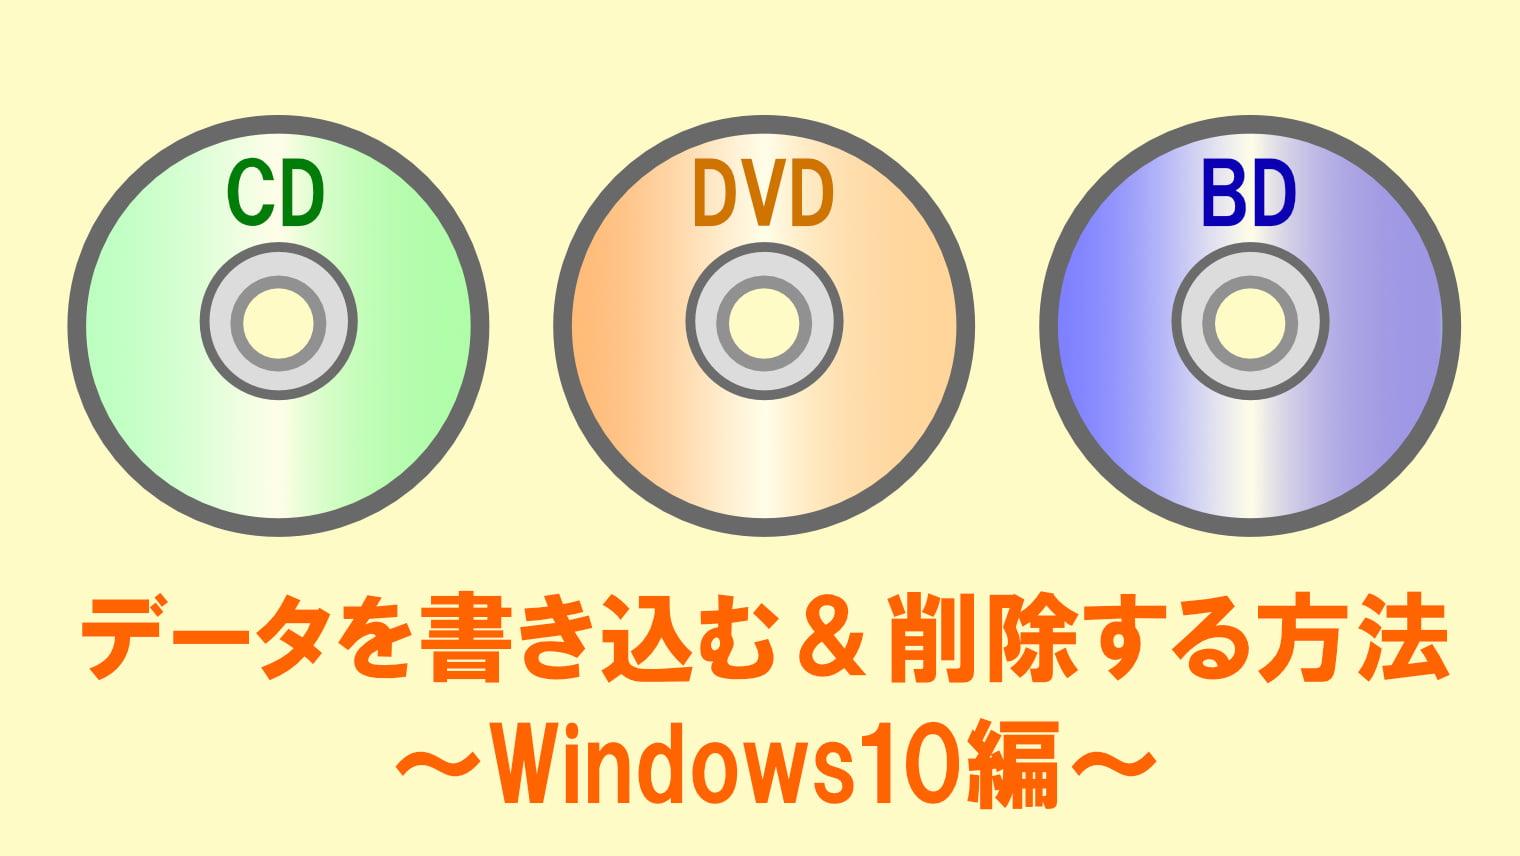 【Windows10】CD/DVD/BDのデータを書き込む・削除する方法